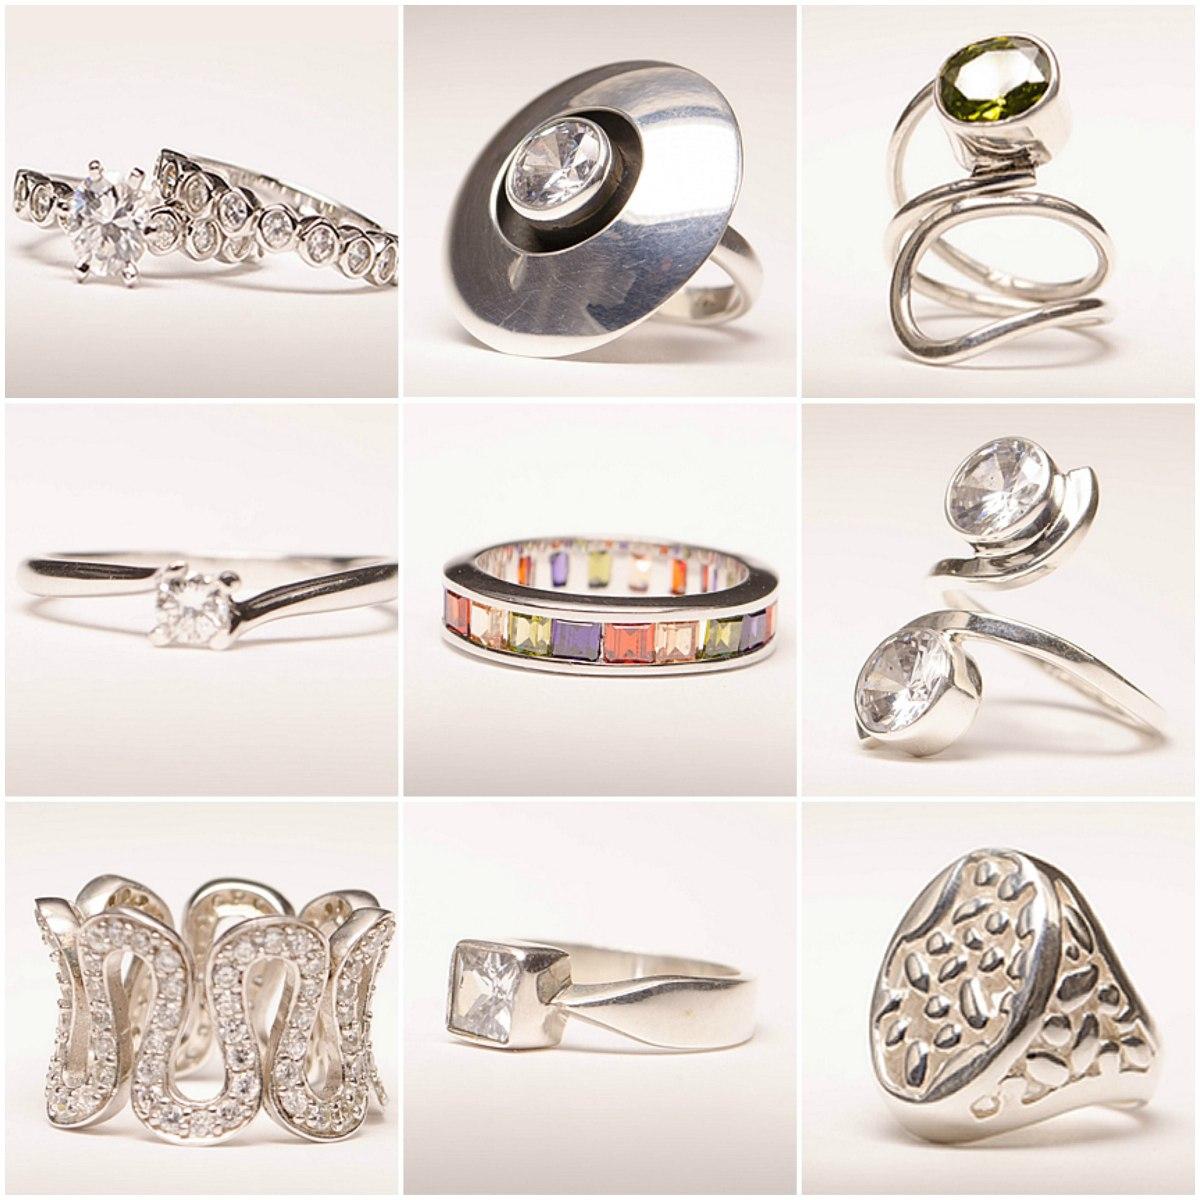 lote piezas de joyeria fina chapa oro y plata